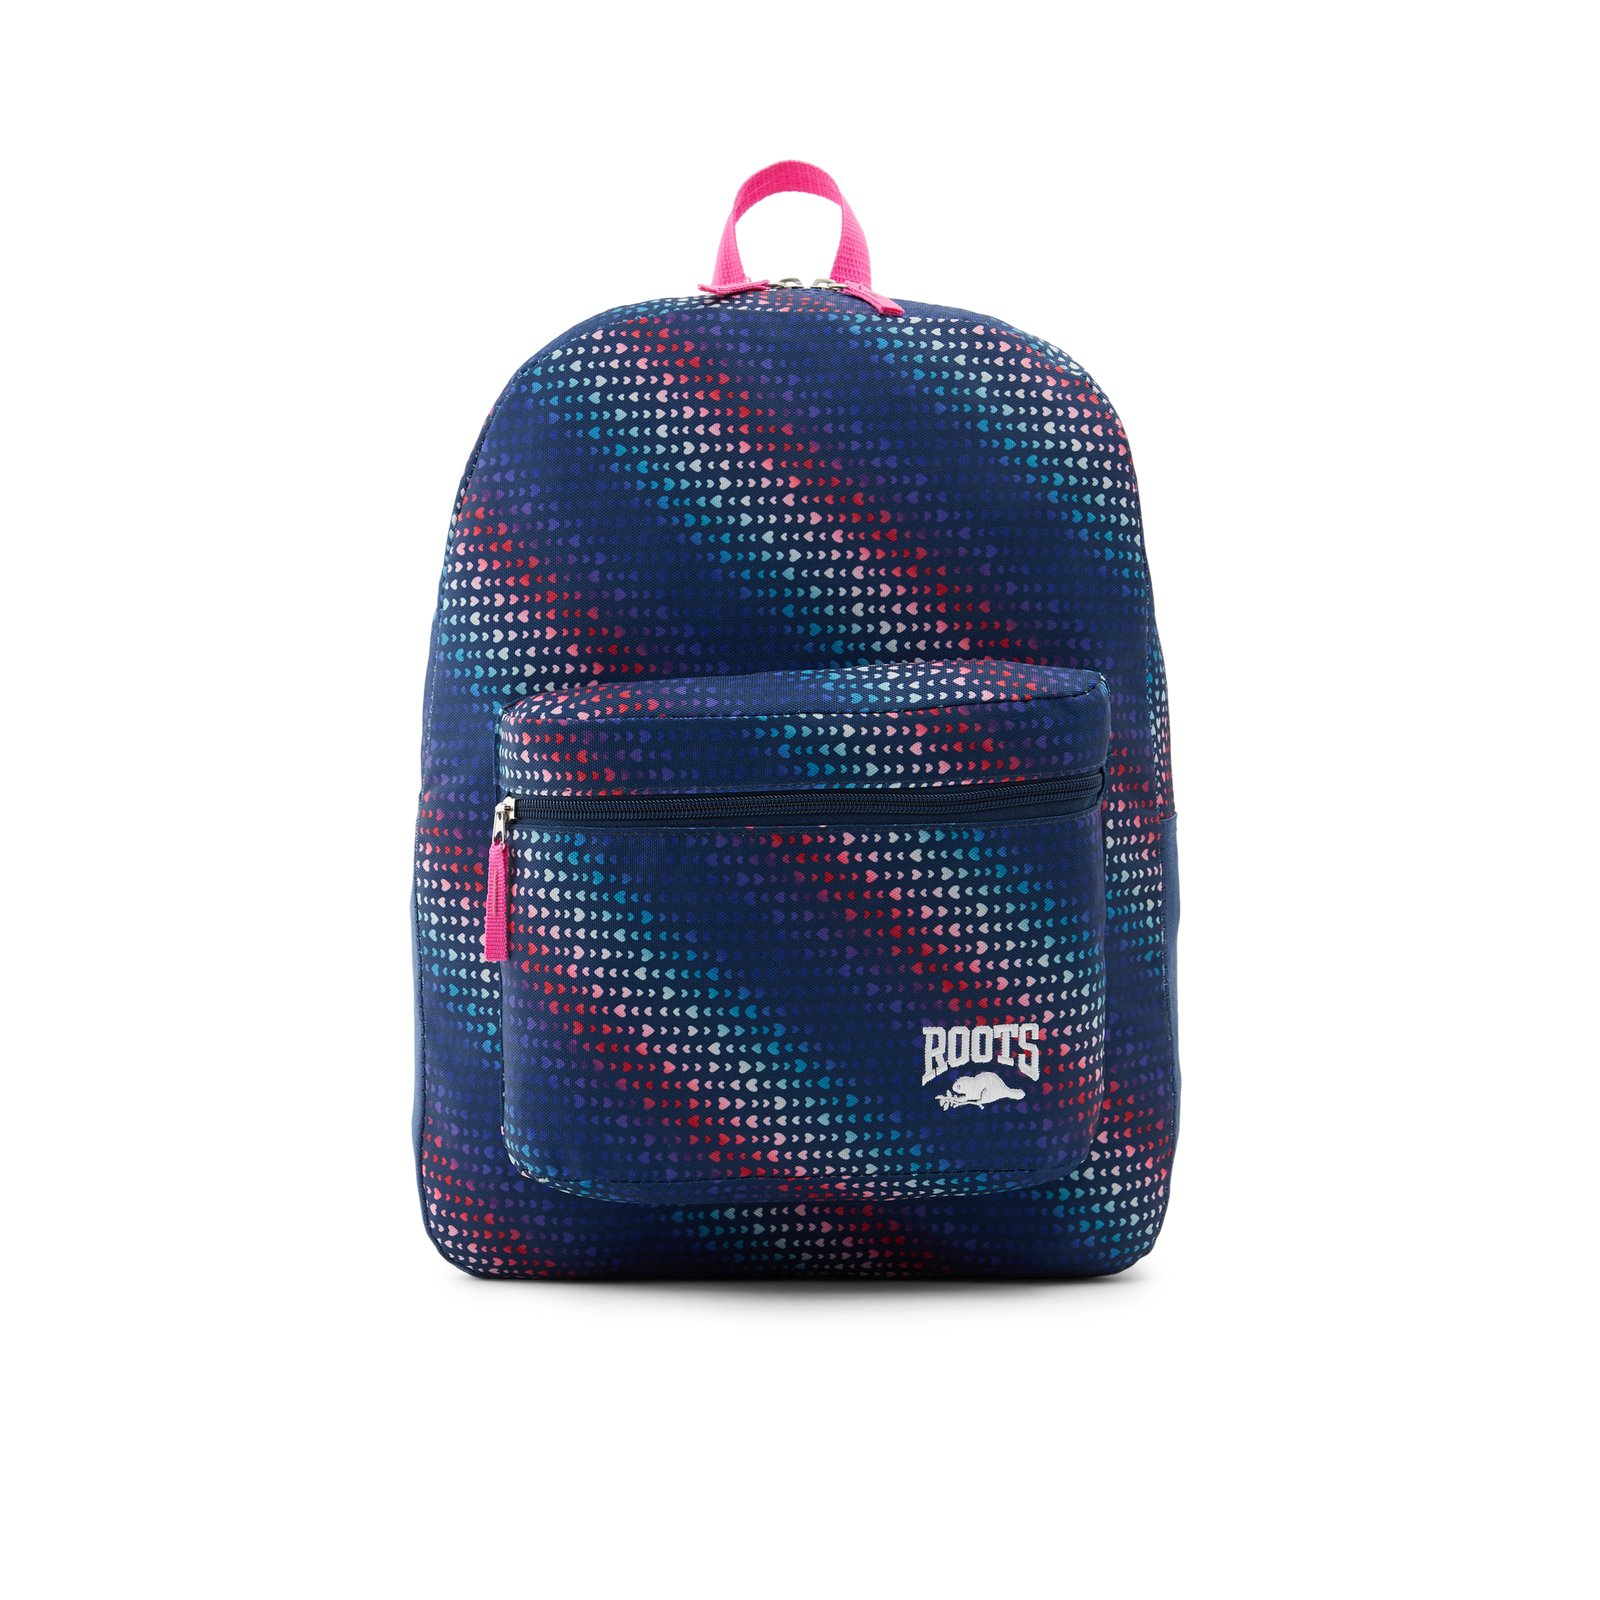 Roots Malte - Women's Handbags Backpacks - Multi photo